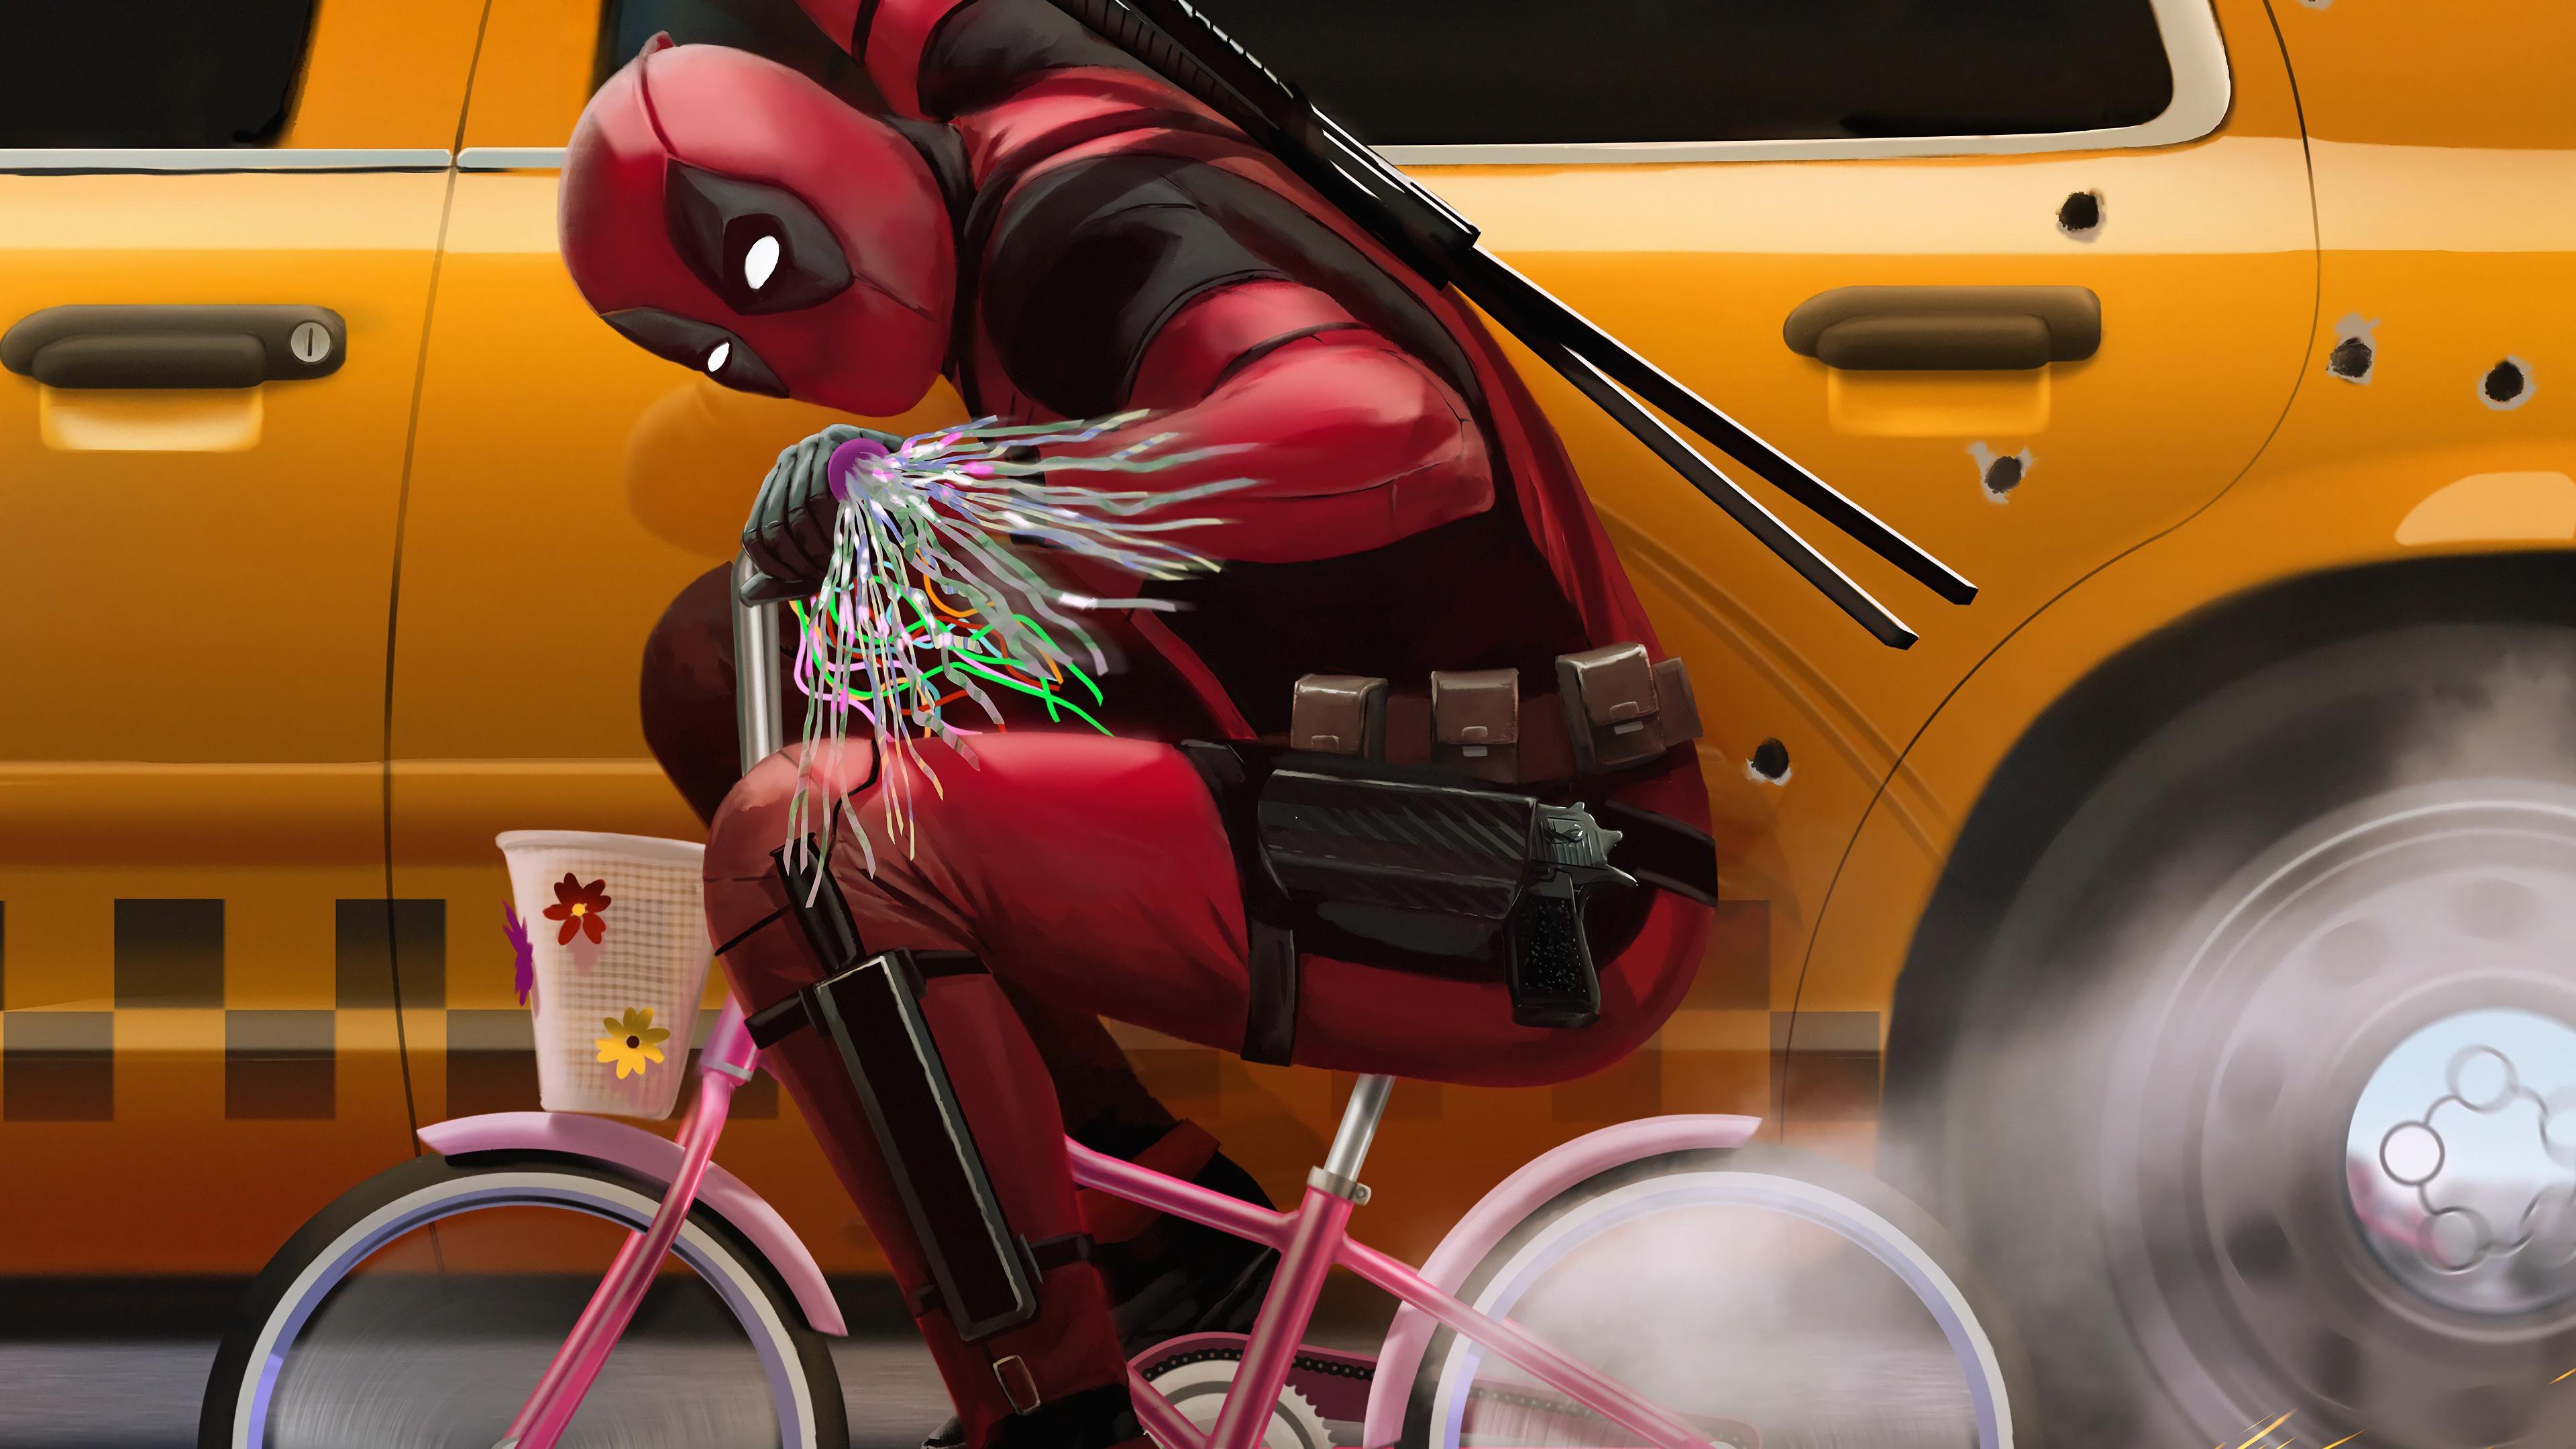 Super Duper Cute Wallpapers Deadpool Riding Bike Deadpool 2 Movie 4k Wallpaper